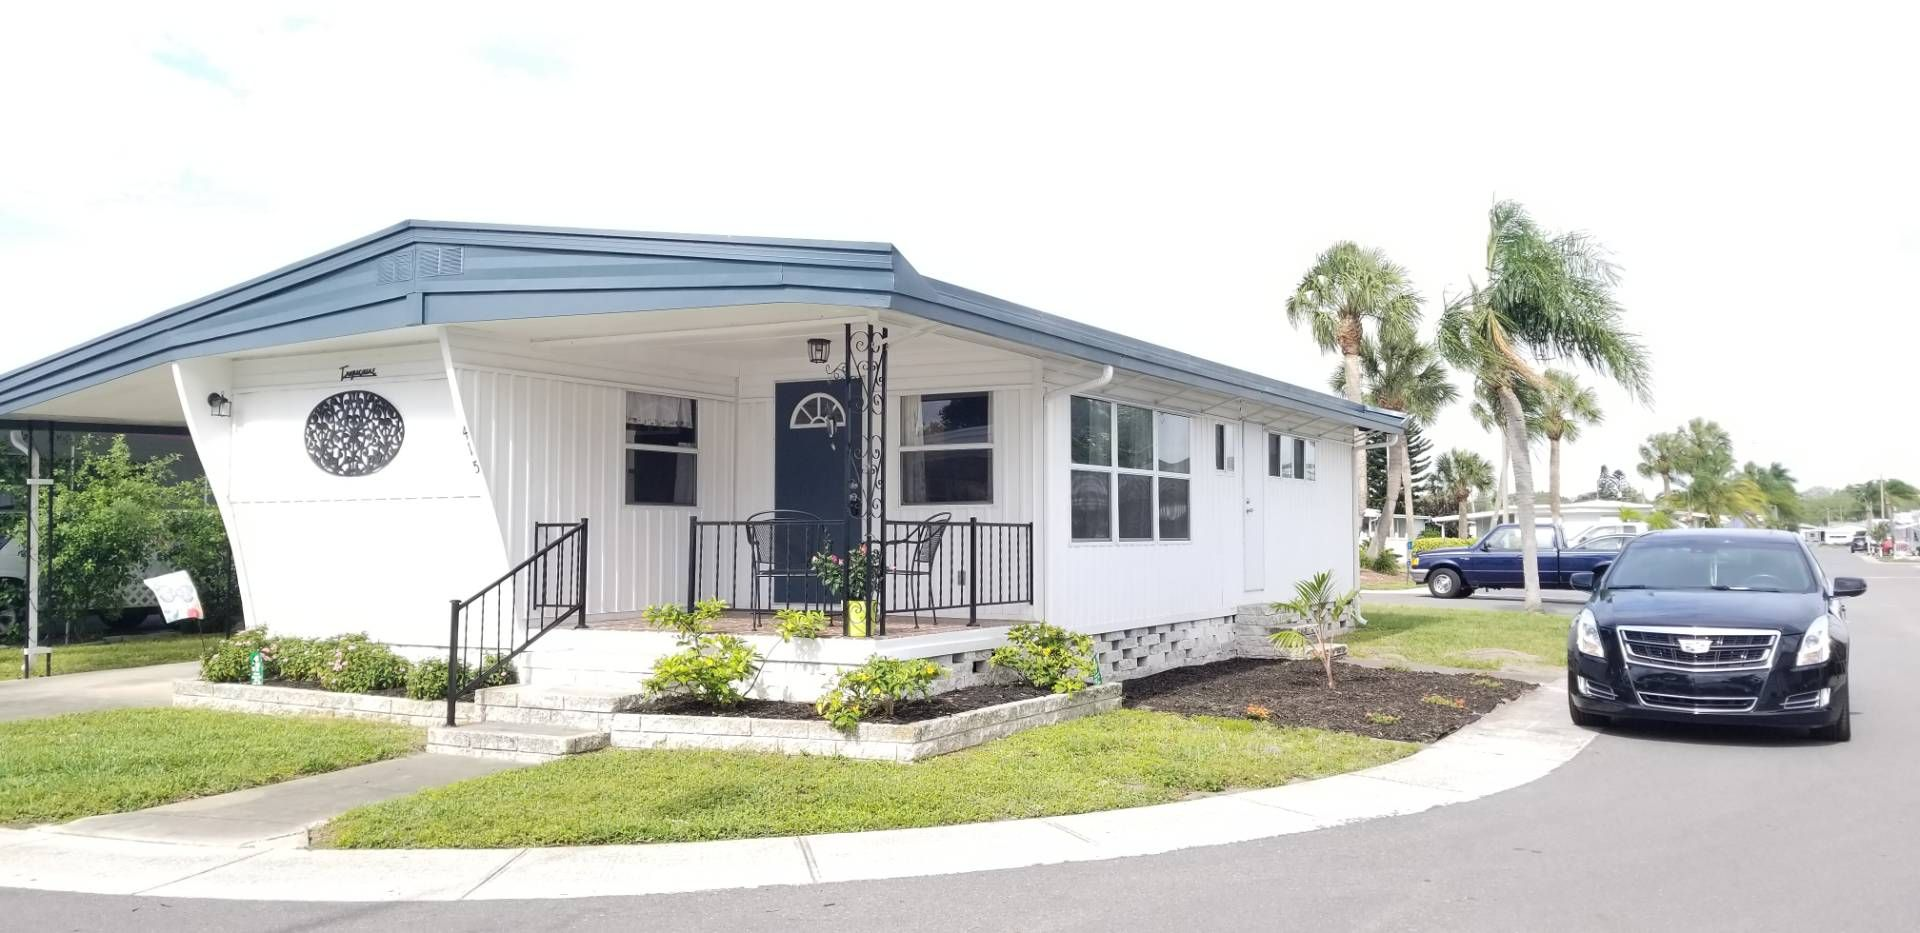 1415 Main St #415, Dunedin, FL 34698 - Estimate and Home Details ...